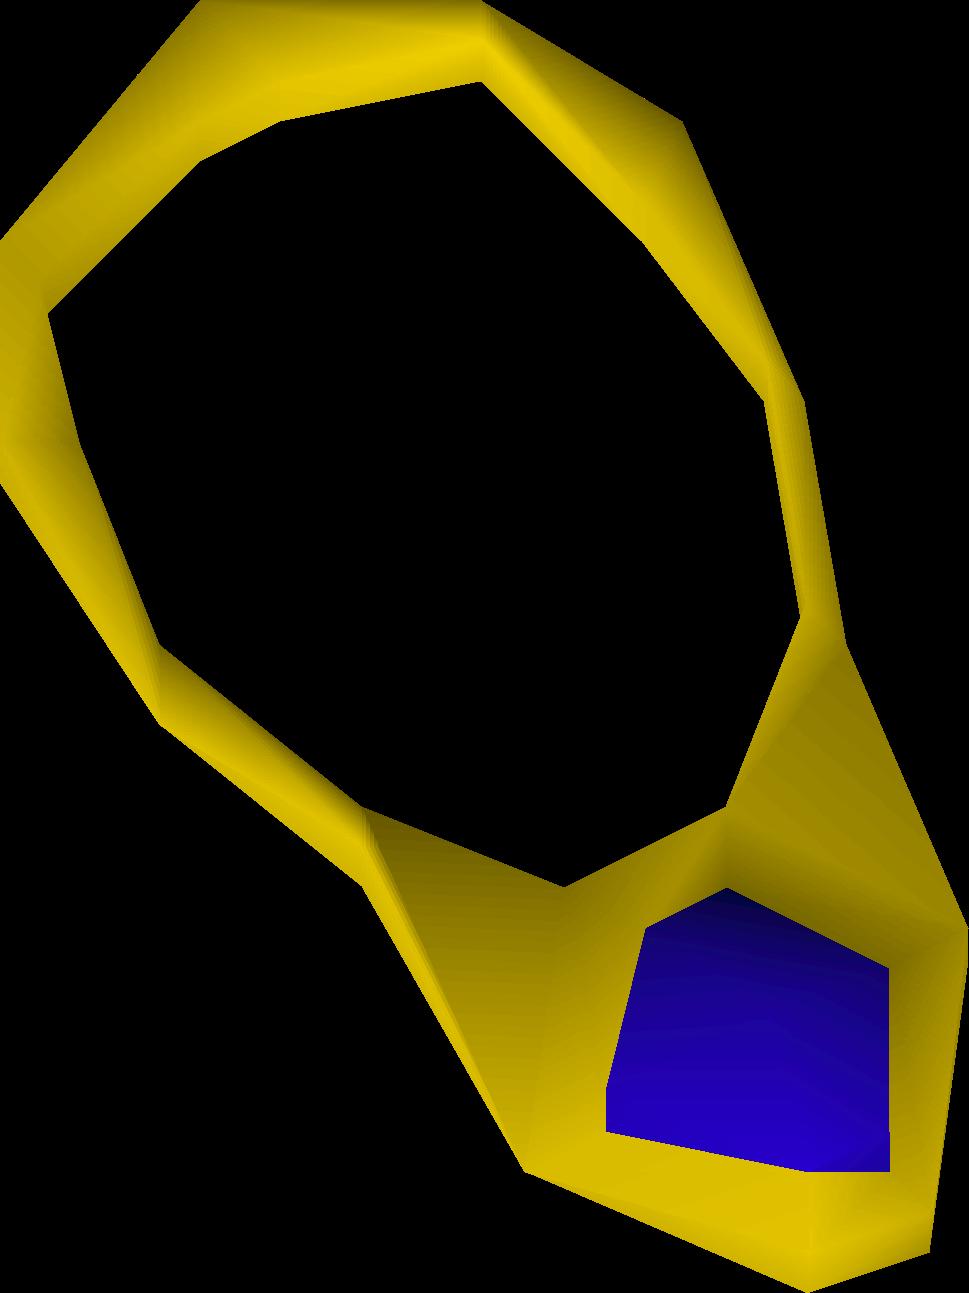 Sapphire necklace | Old School RuneScape Wiki | FANDOM powered by Wikia